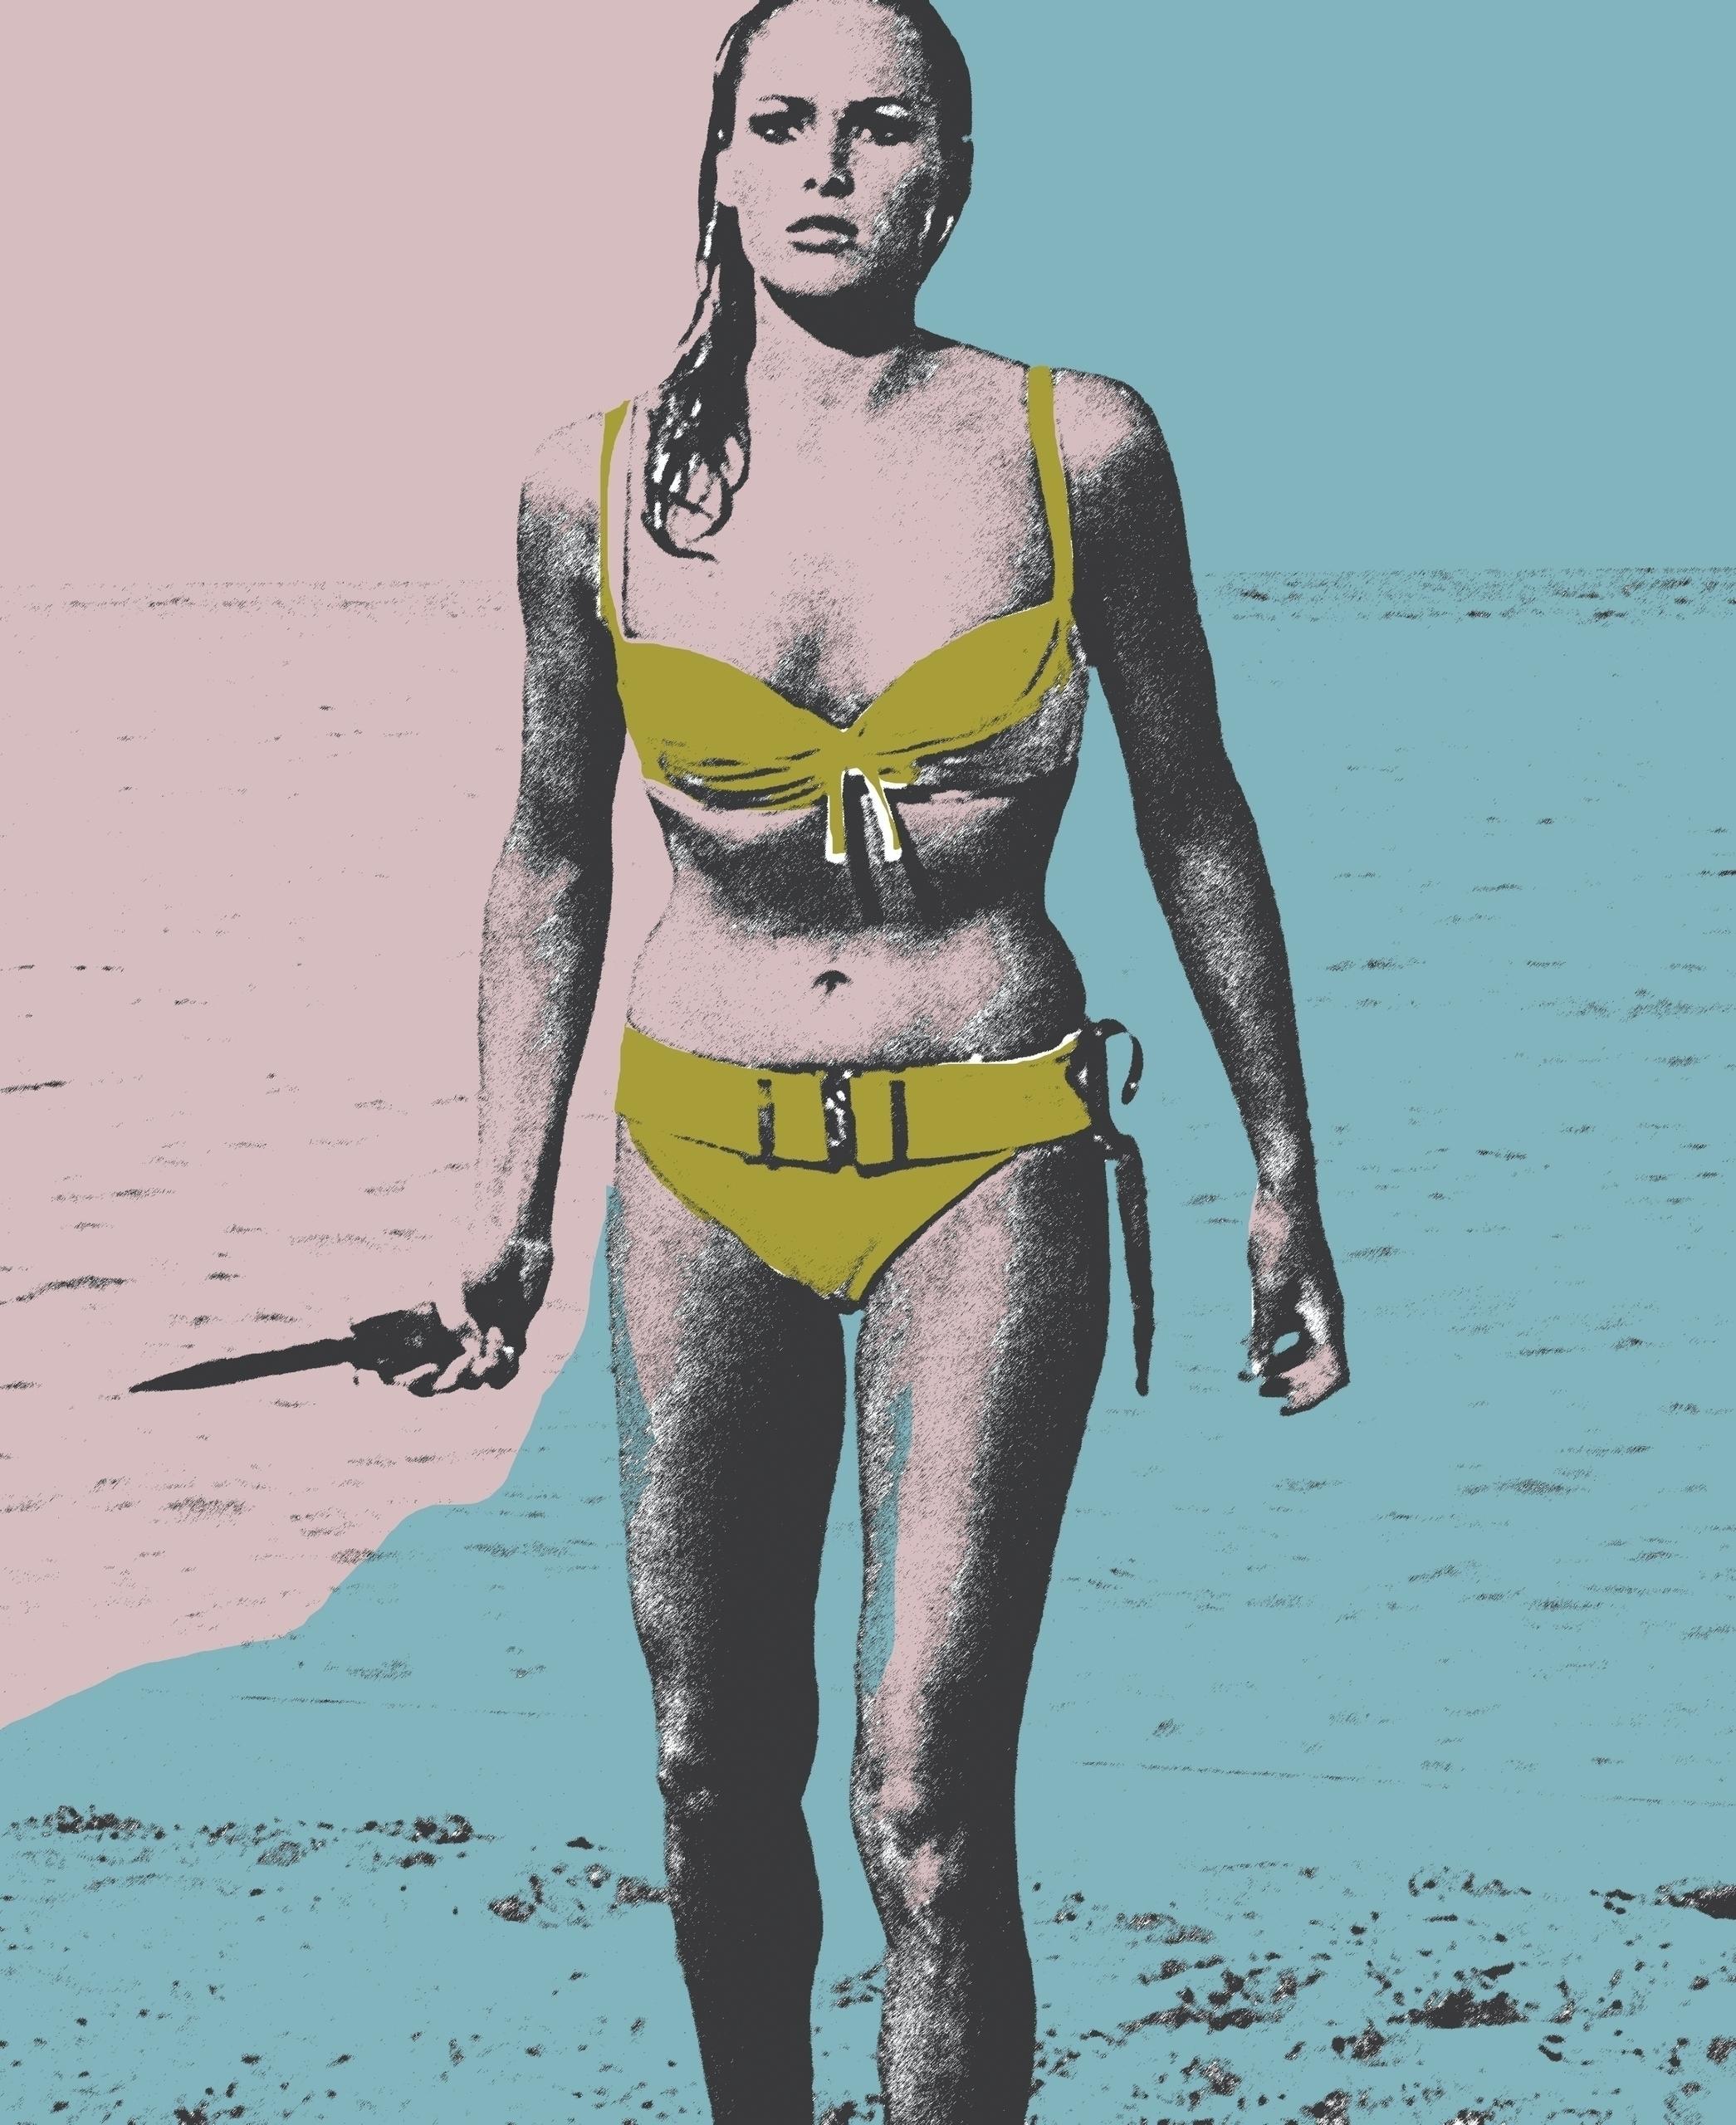 beach Dr. James Bond screenprin - michibroussard | ello